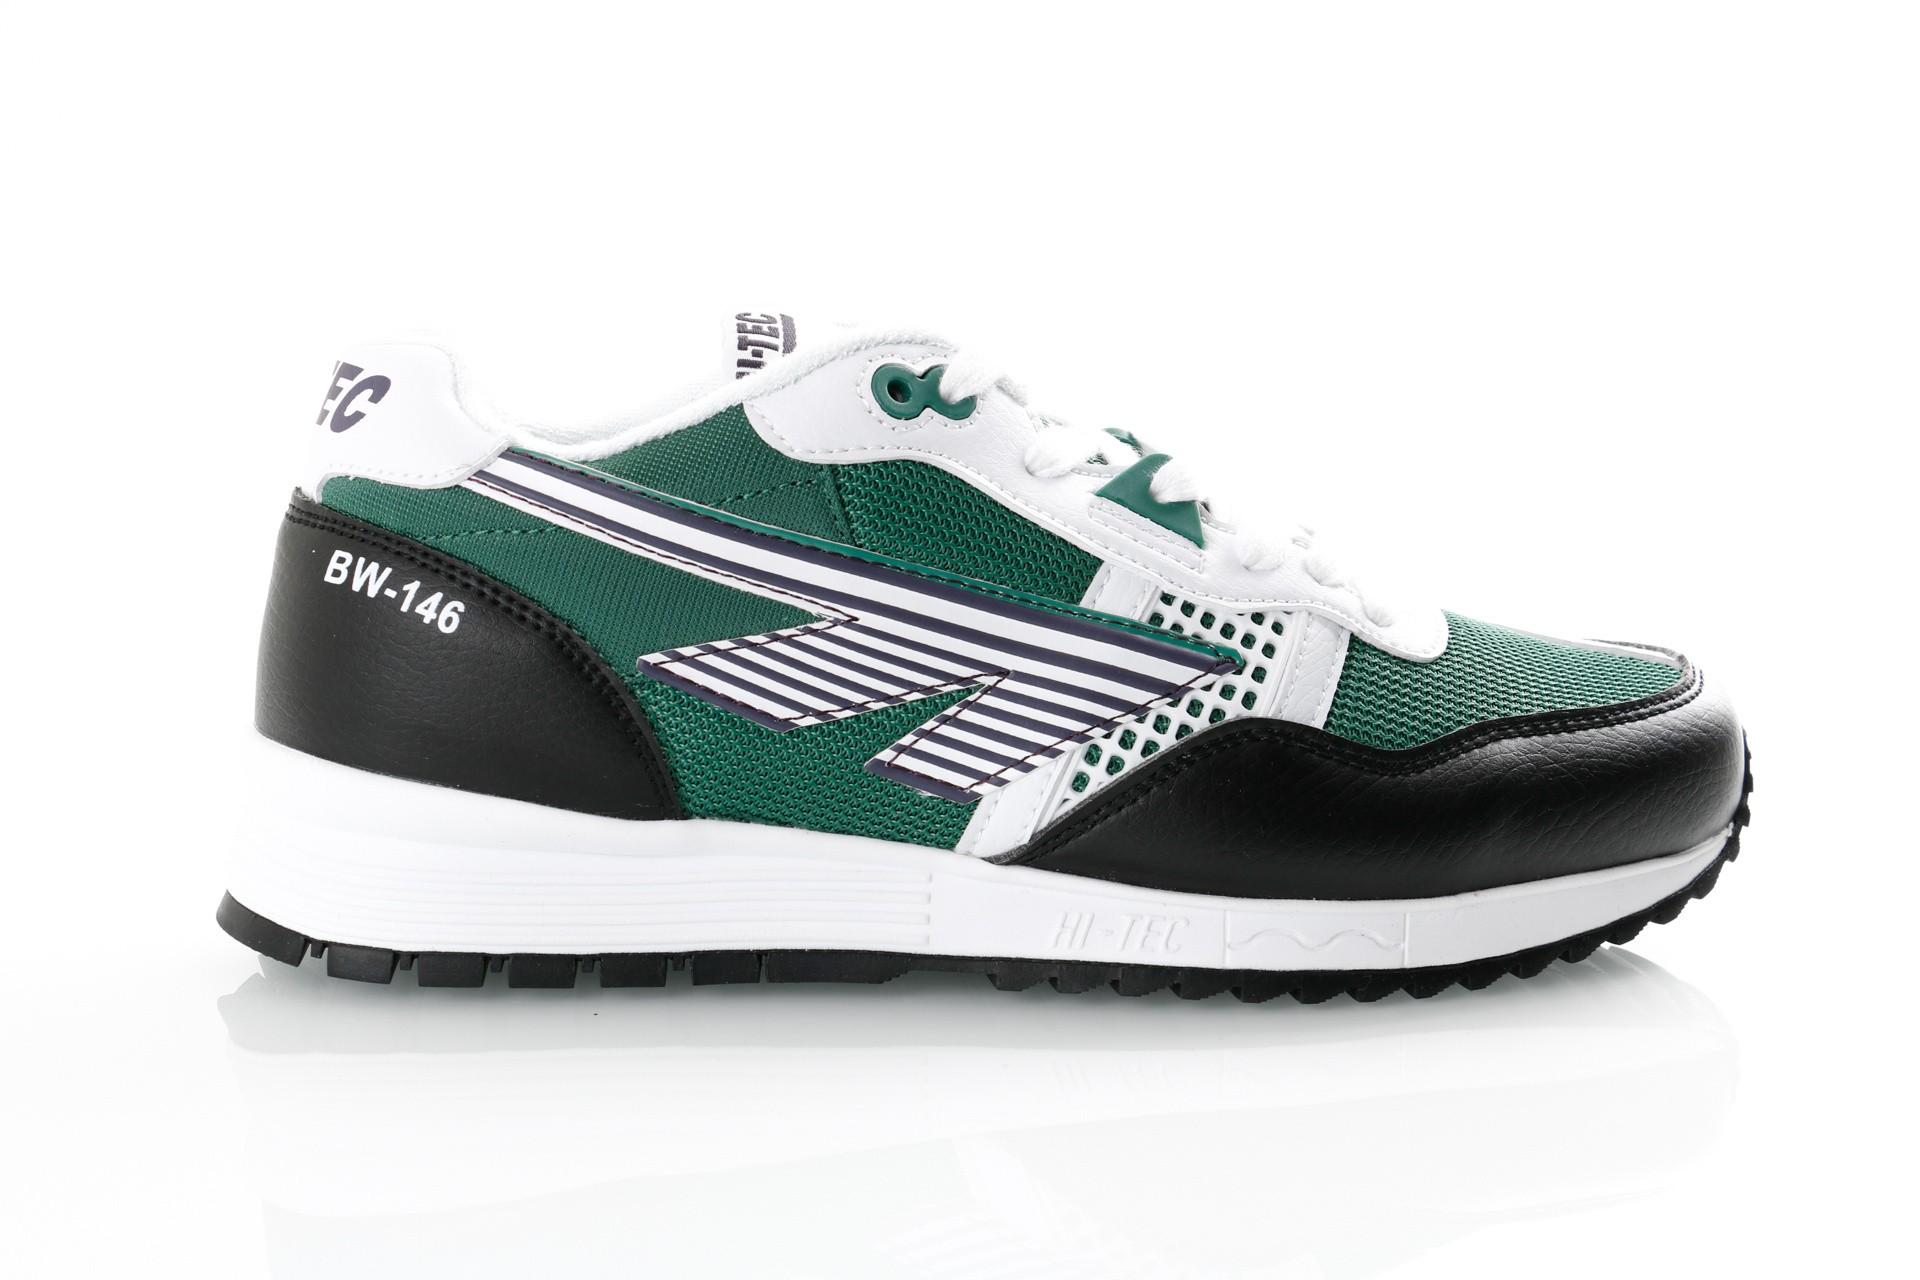 Foto van Hi-Tec Bw 146 S010003/011 Sneakers White/Green / Purple